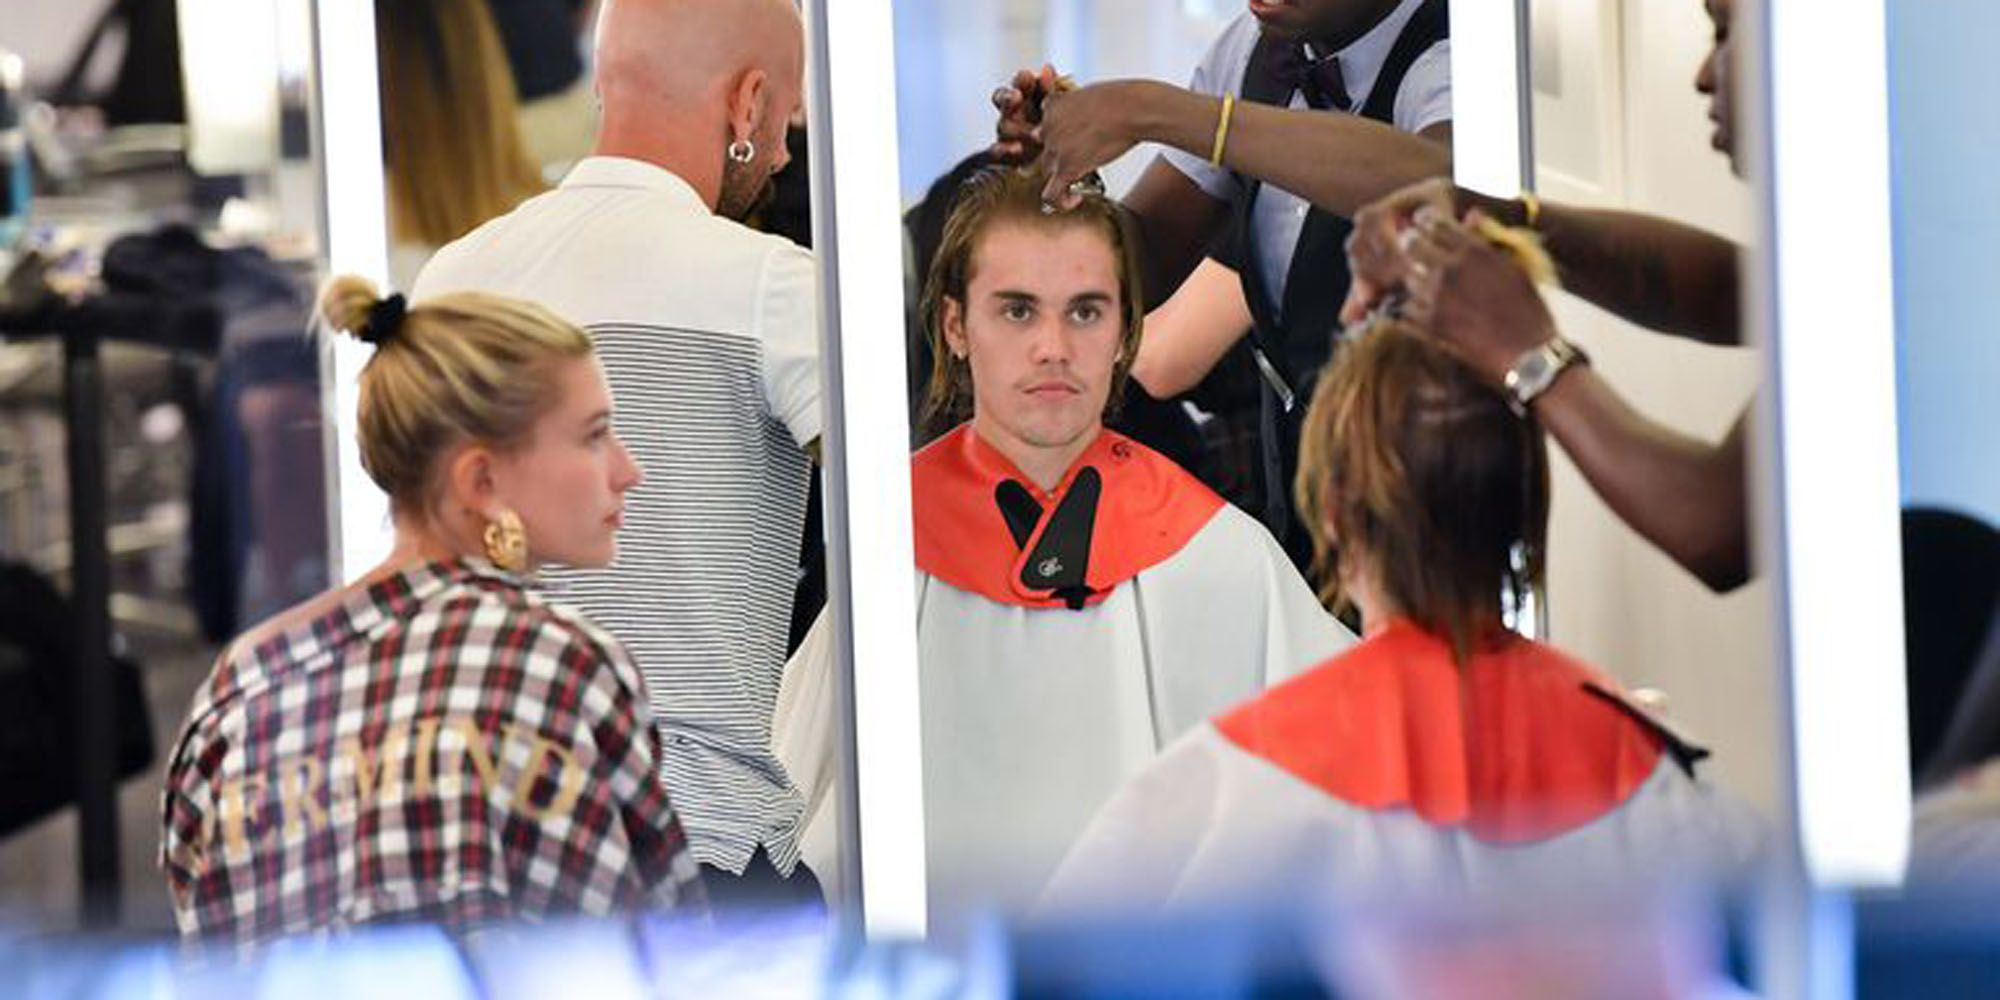 Justin Bieber kapper hailey baldwin